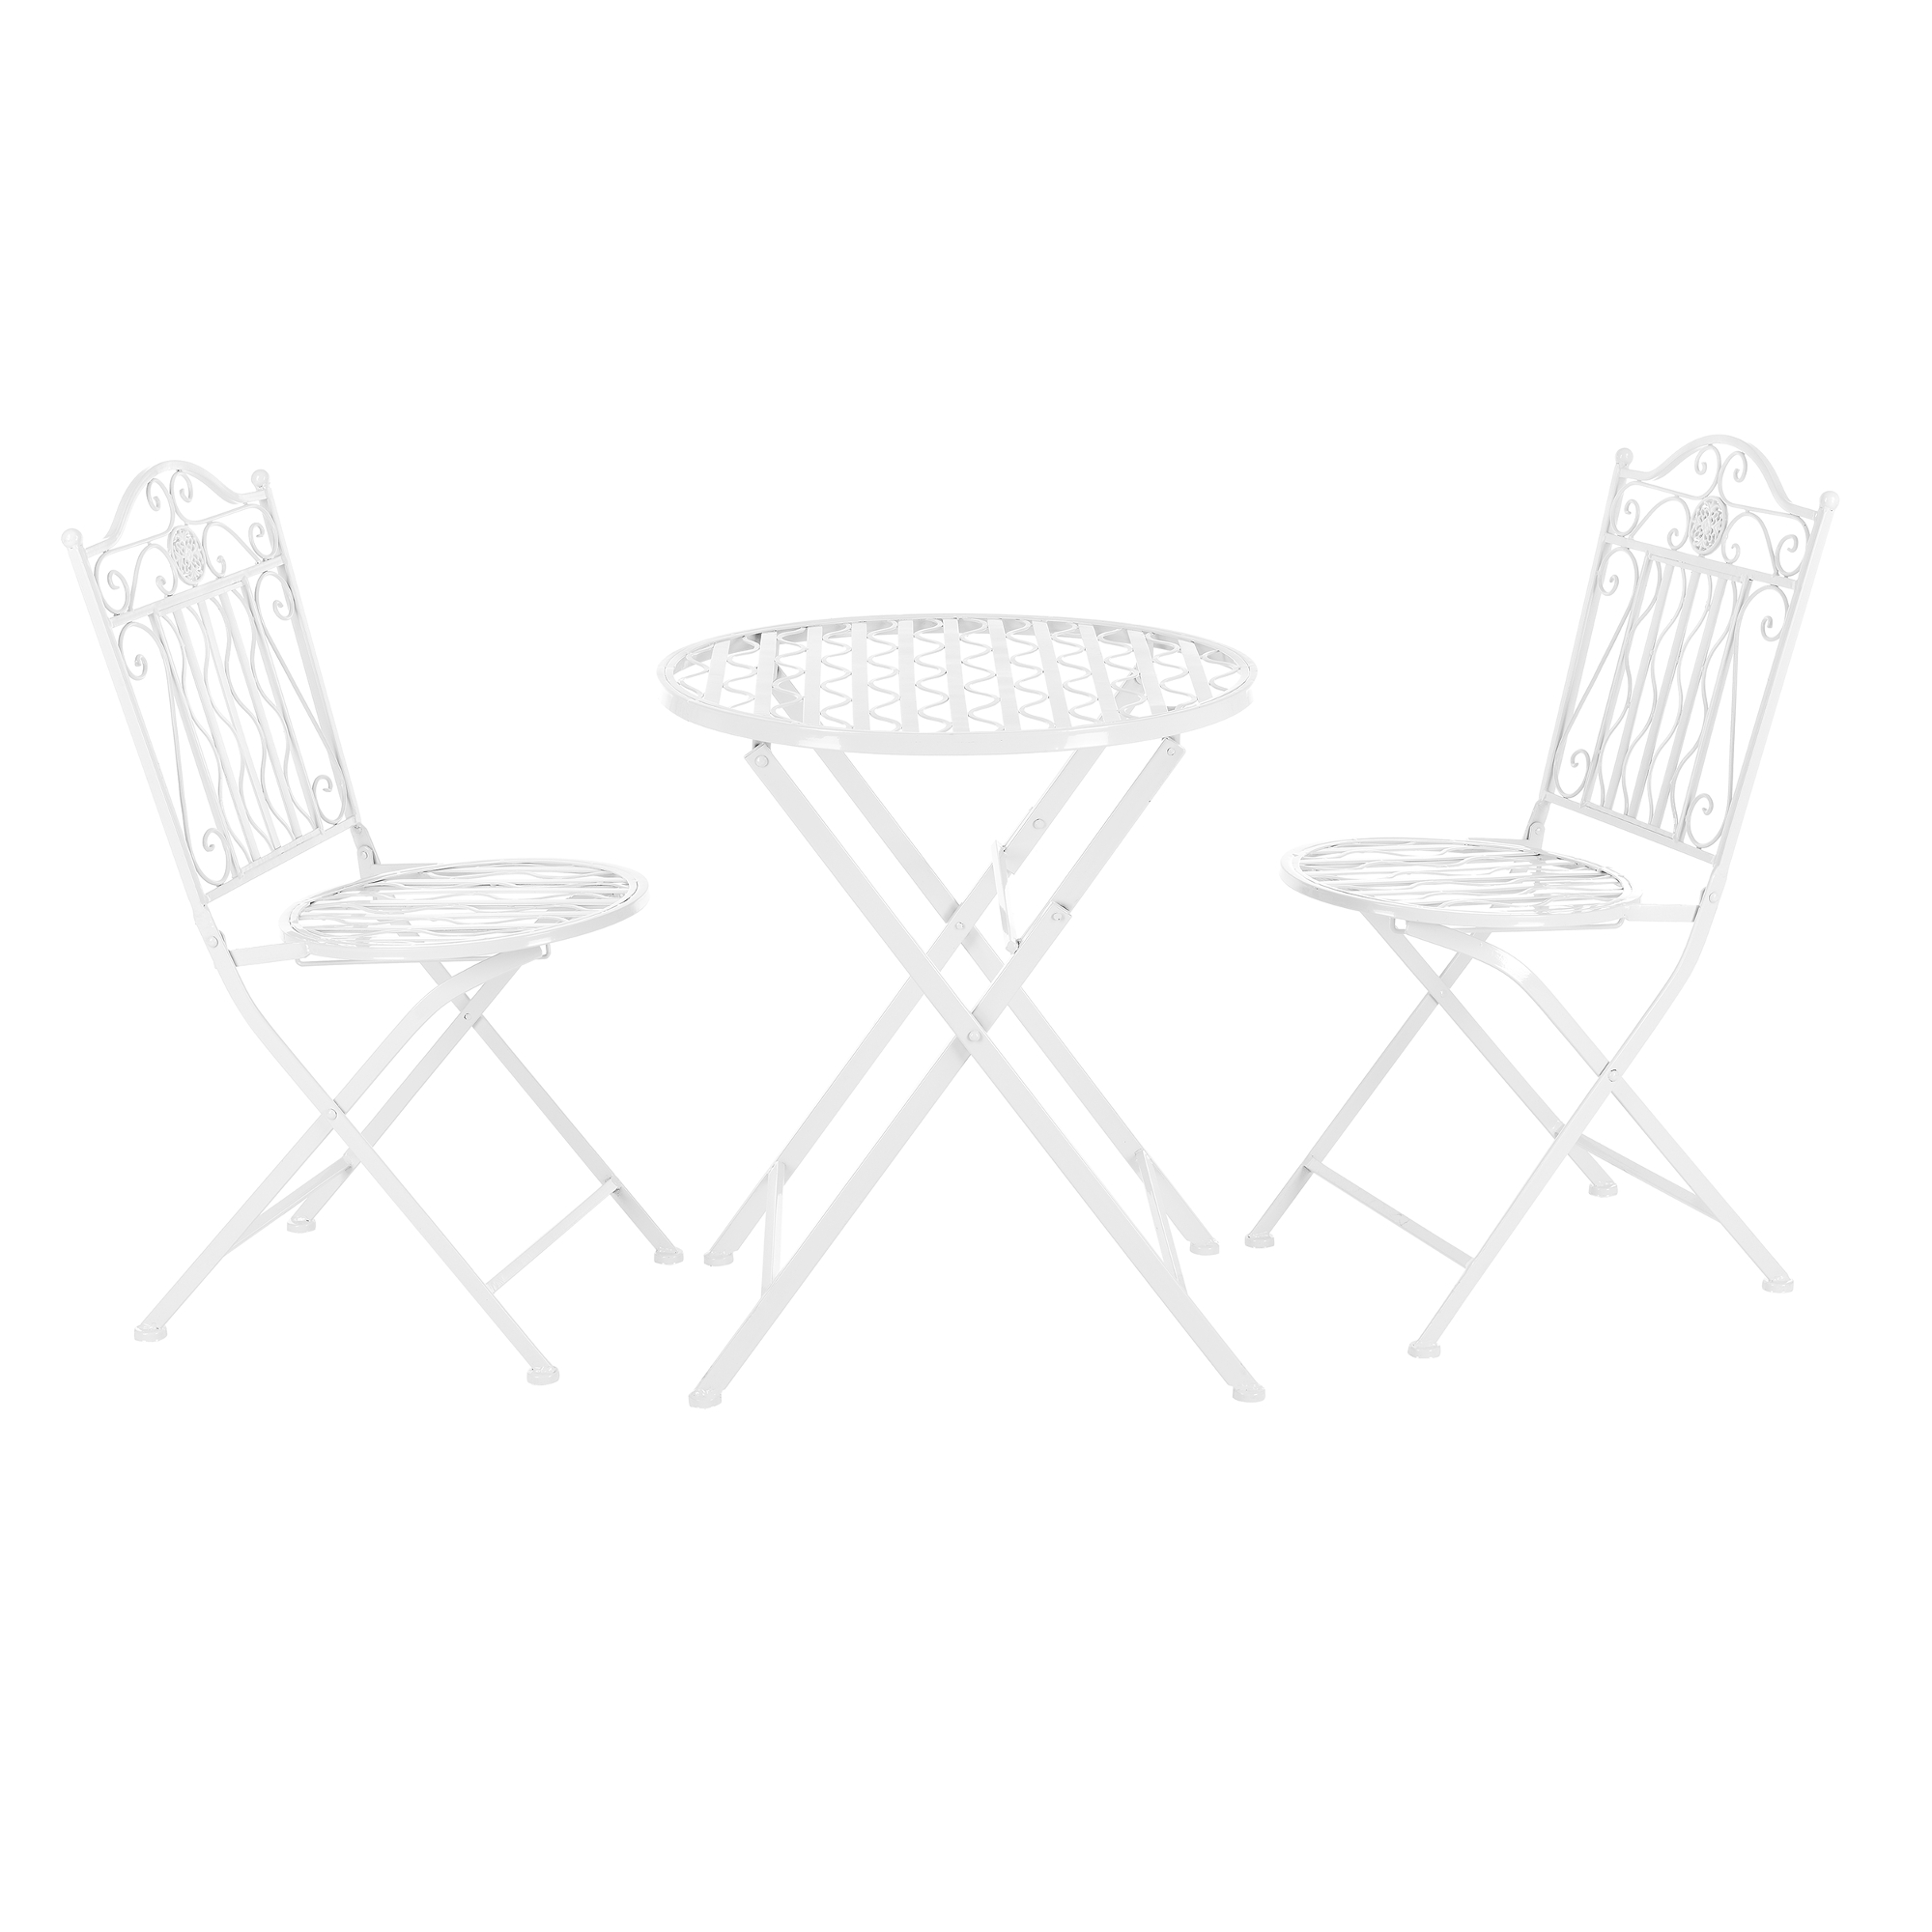 [casa.pro]® Bistro Set - kulatý stůl s 2 židlemi, 71 x 60 cm,89 x 65 x 40 cm,46 cm,bilá